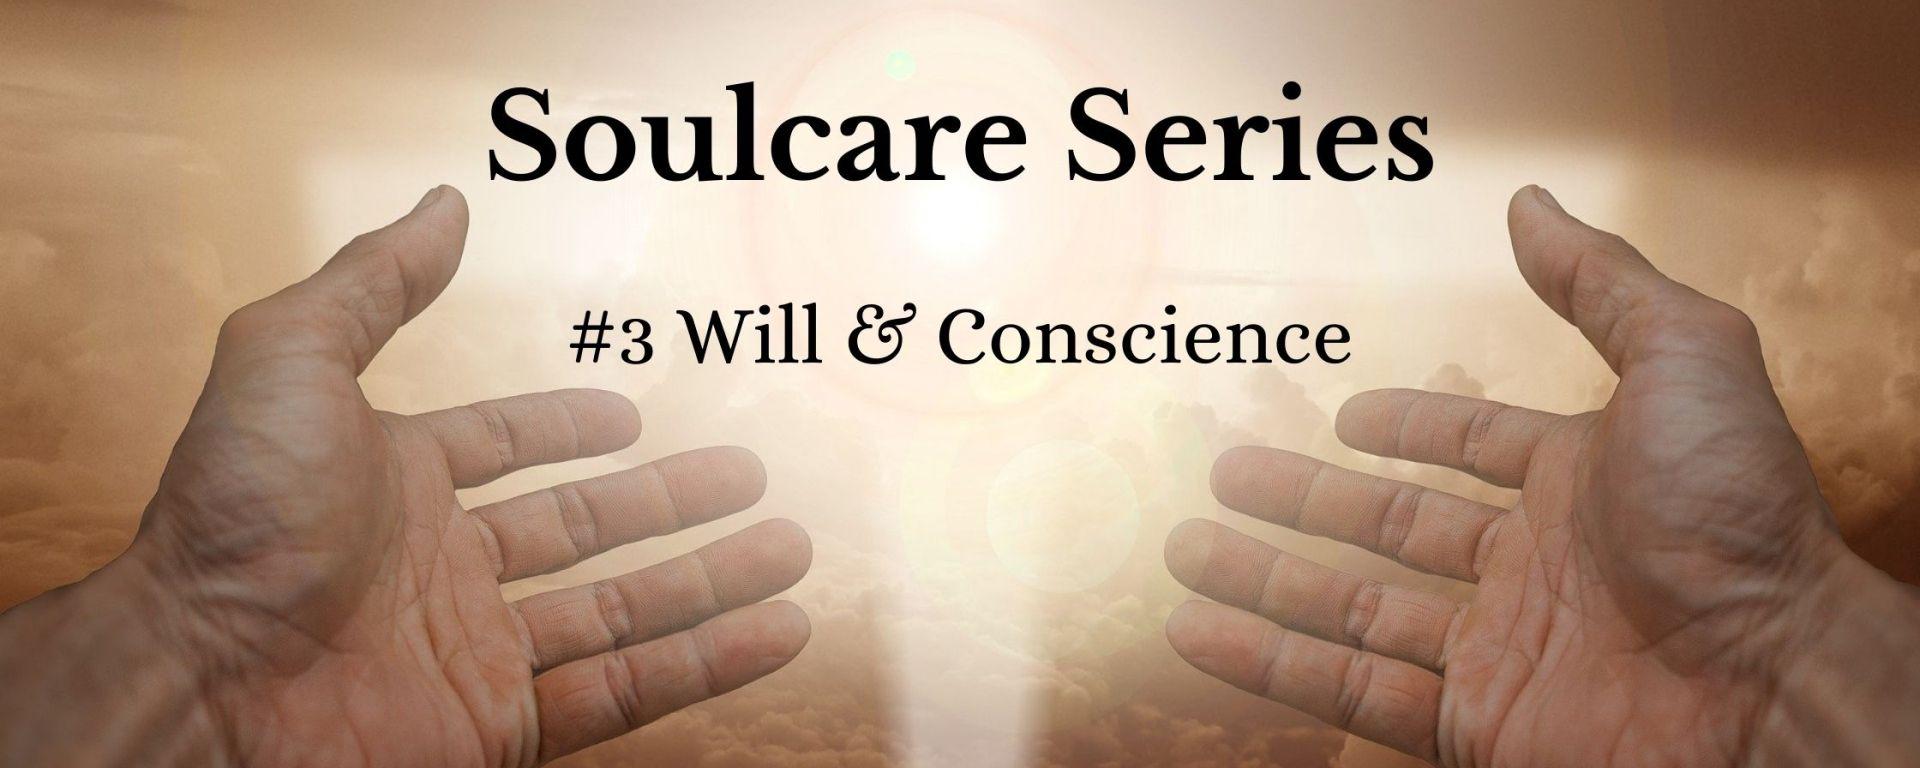 Will & Conscience